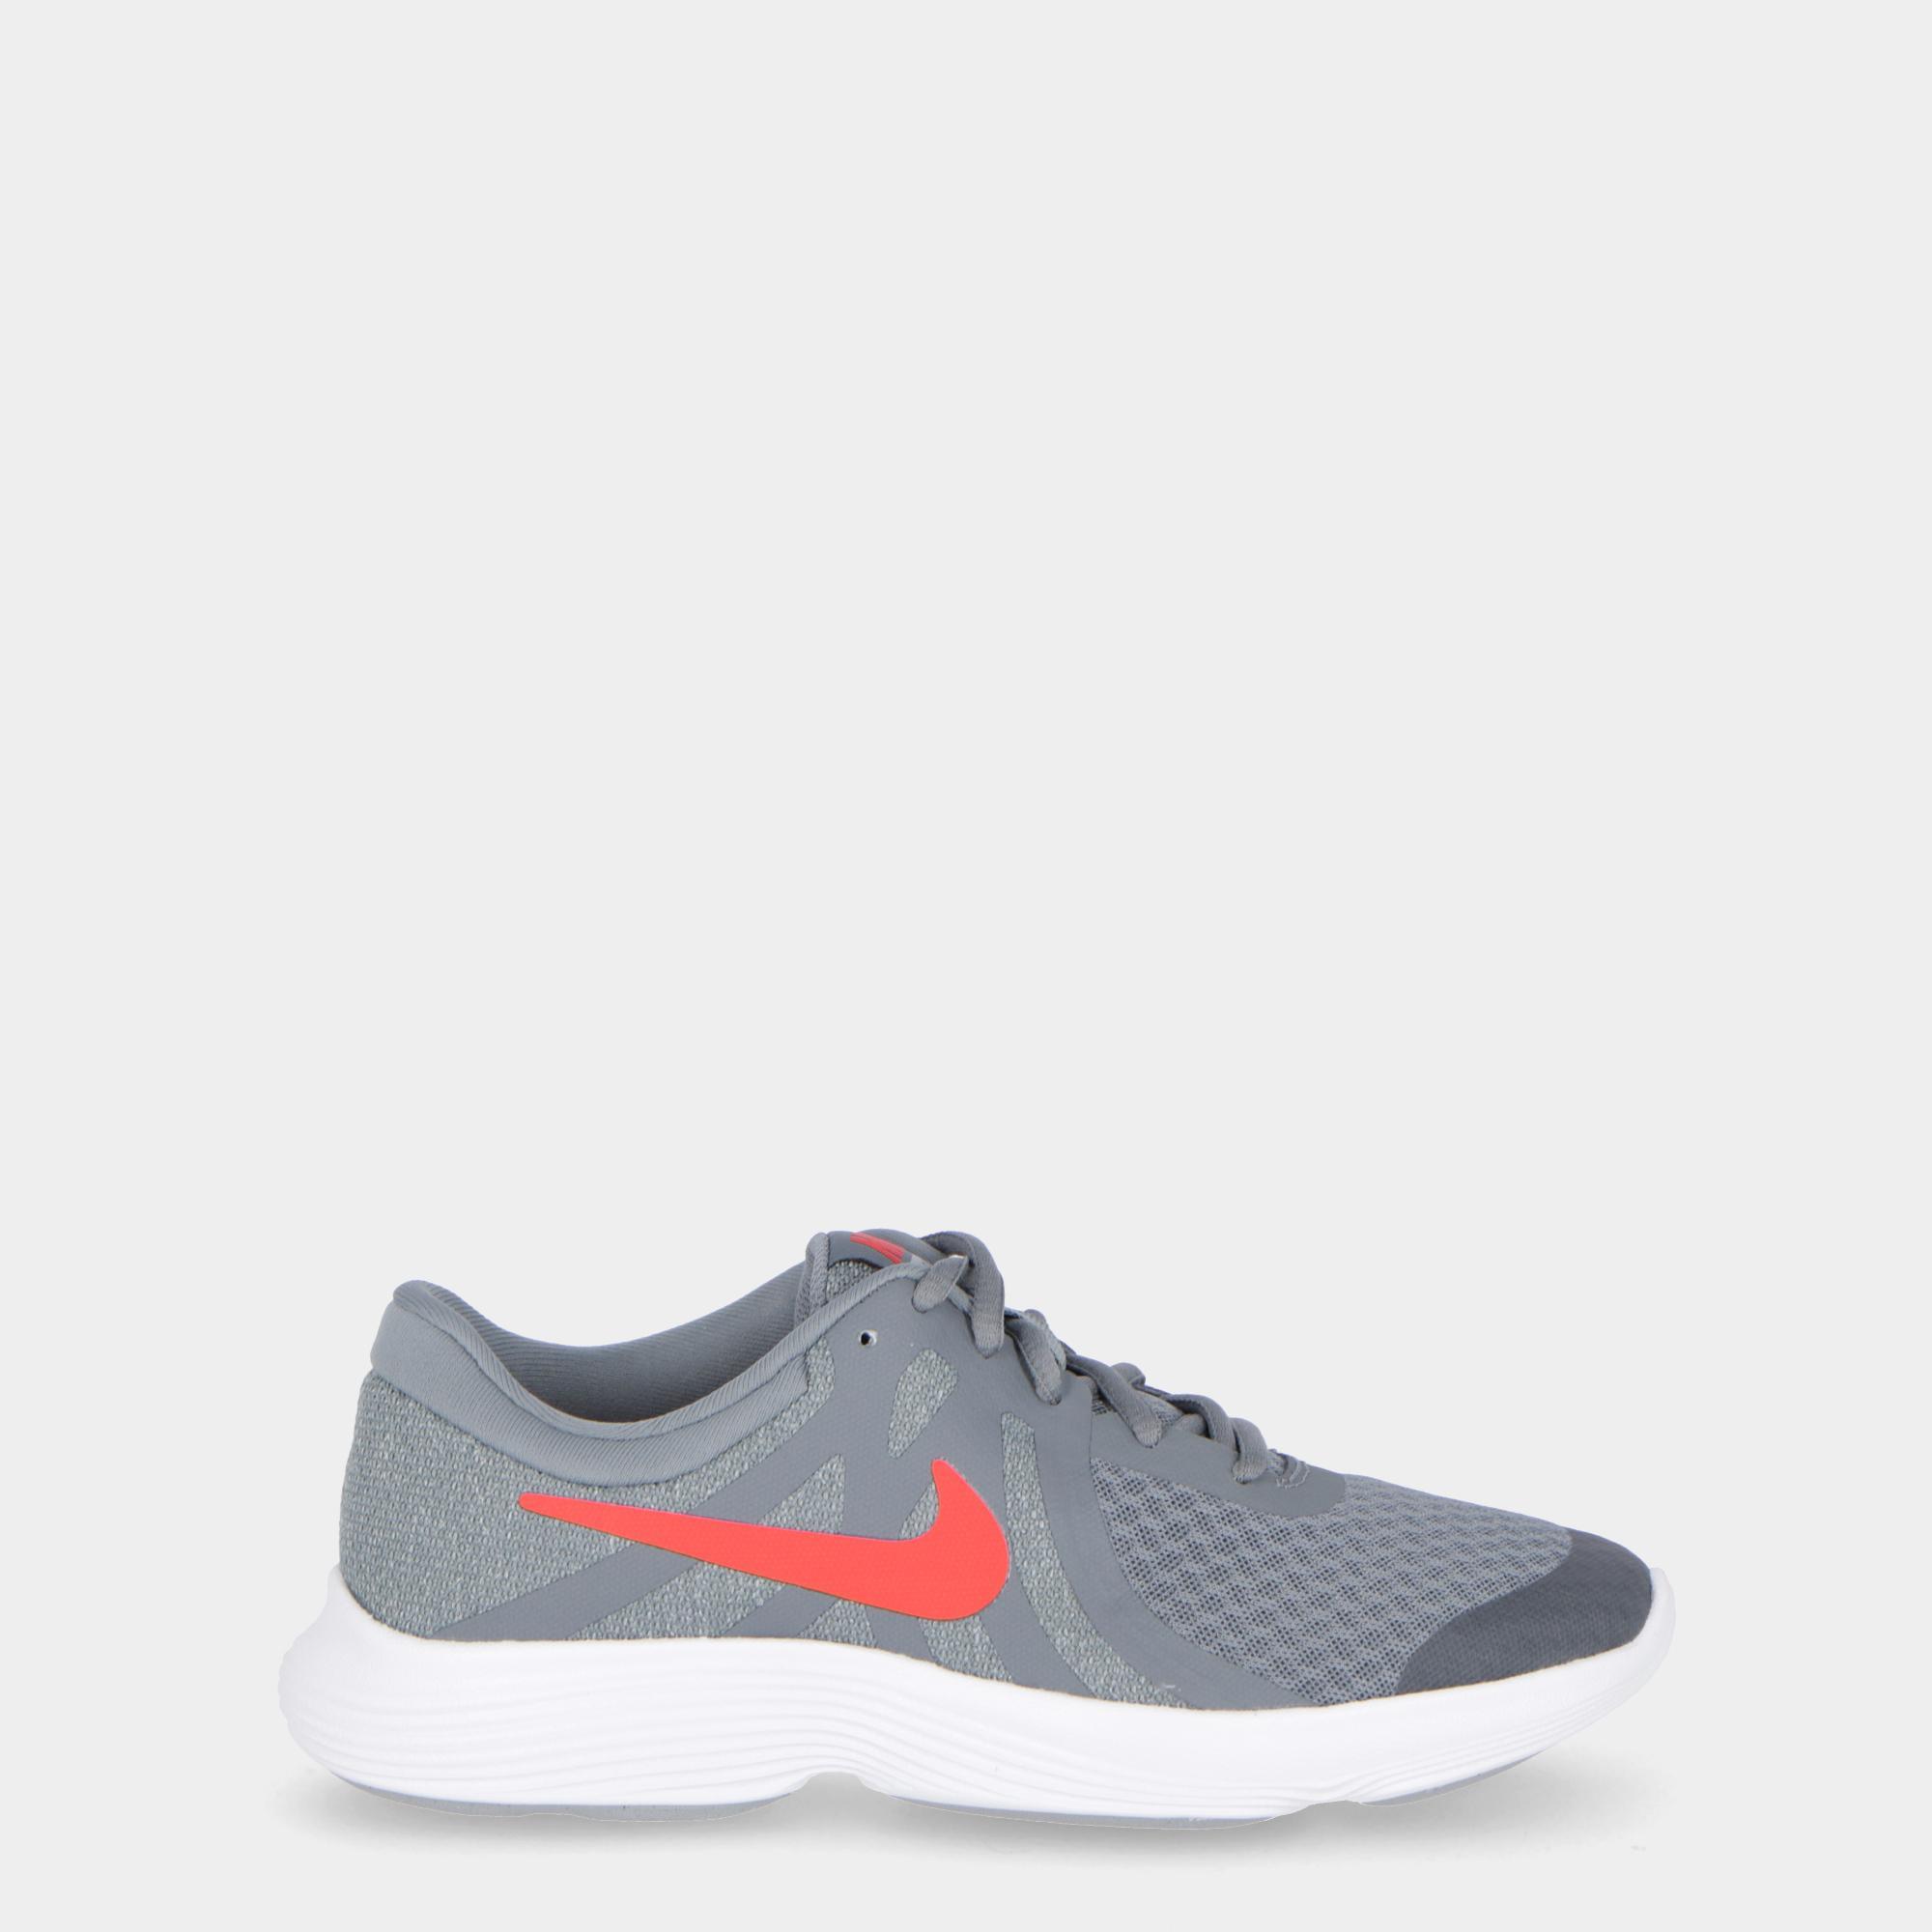 89ca6985b3b6 Nike Revolution 4 (gs) Grey red white